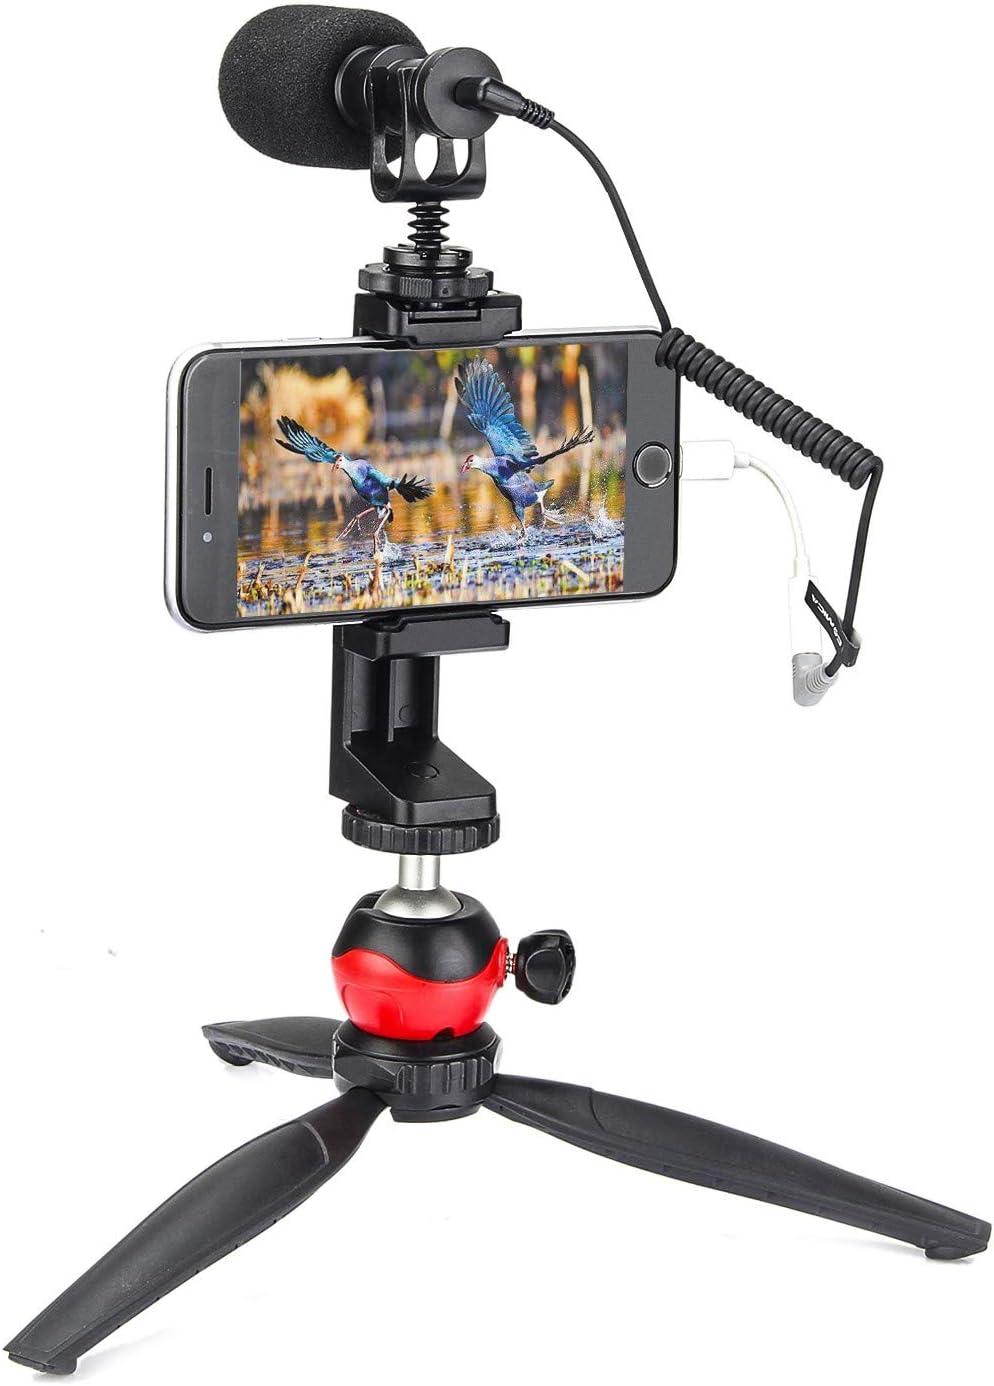 EACHSHOT Smartphone Phone Video Film Filmmaking Recording Microphone Vlogging Kit Filmmaker Mini Tripod with Shotgun Video Mic Video Rig for iPhone 11 Pro Max X 8 Plus 7 Plus Samsung Huawei etc.